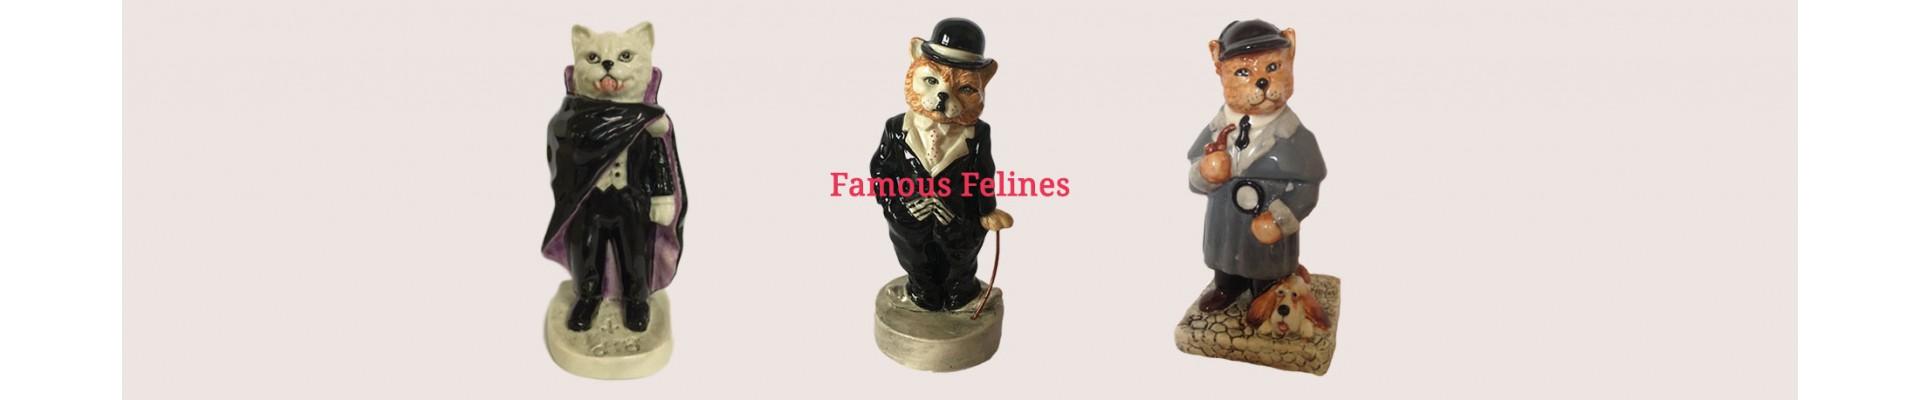 Famouse Felines